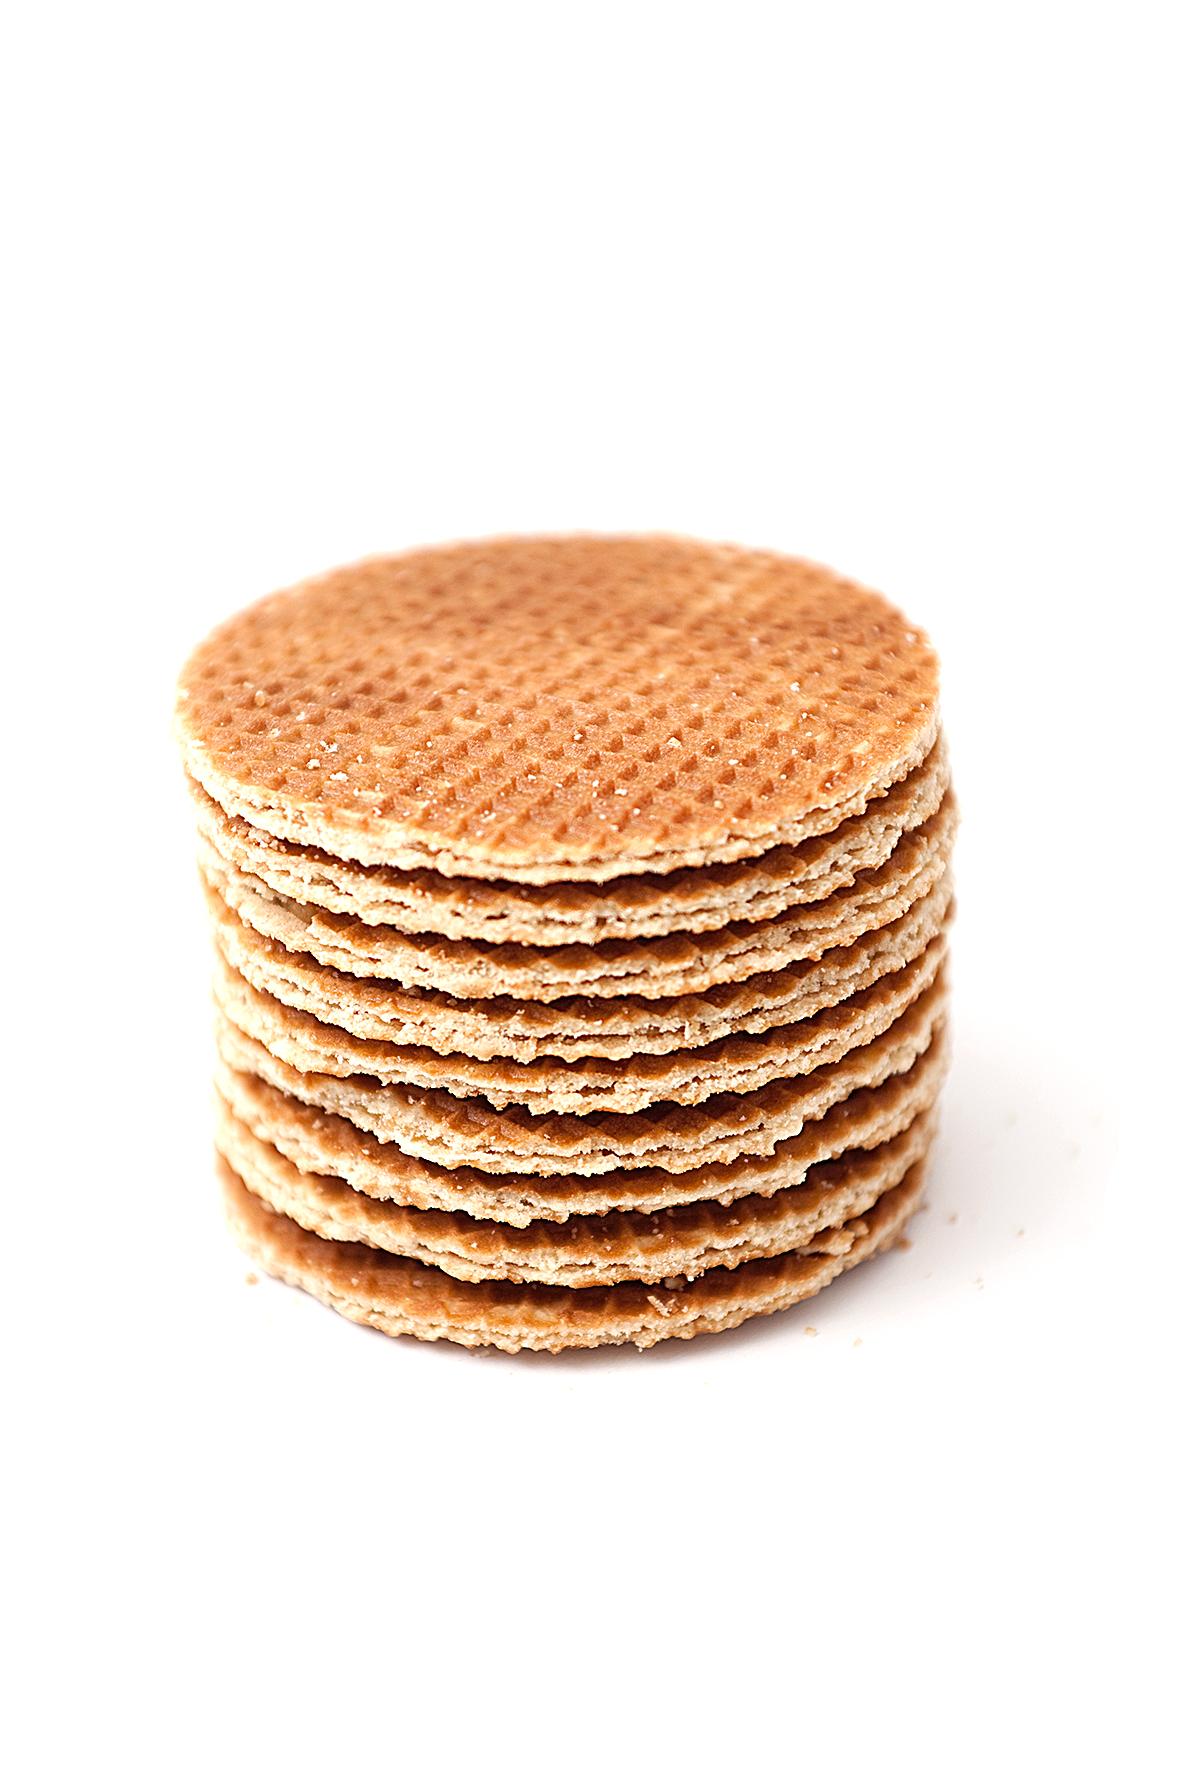 Syrup waffles (Stroopwafels)